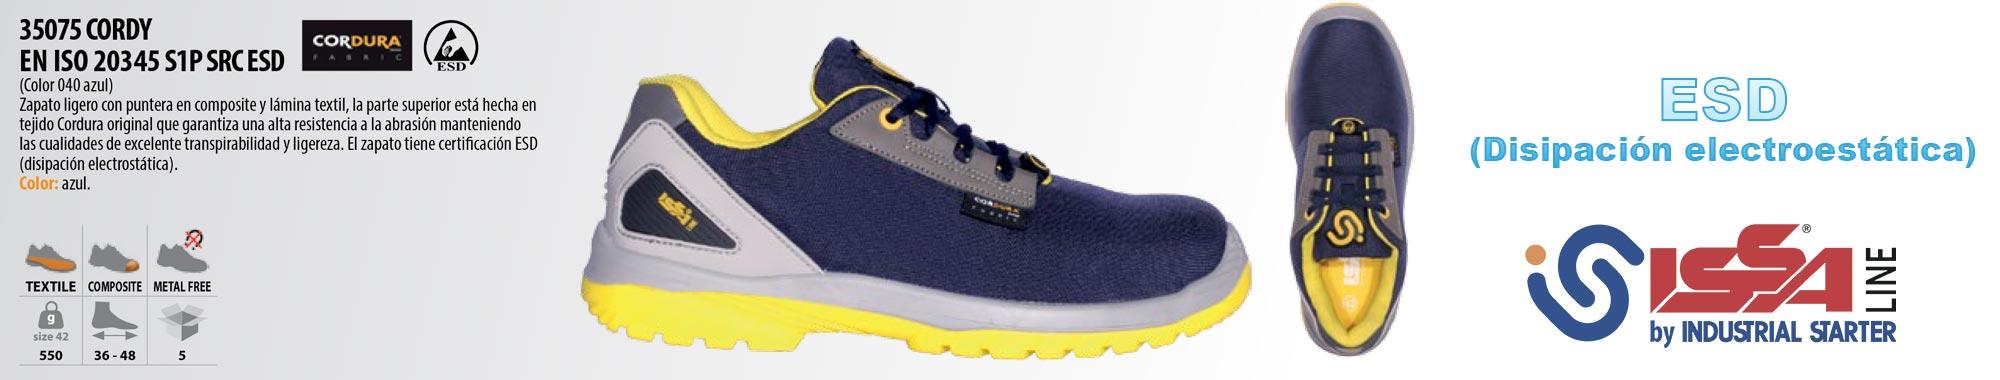 zapato de trabajo rotularte cordy